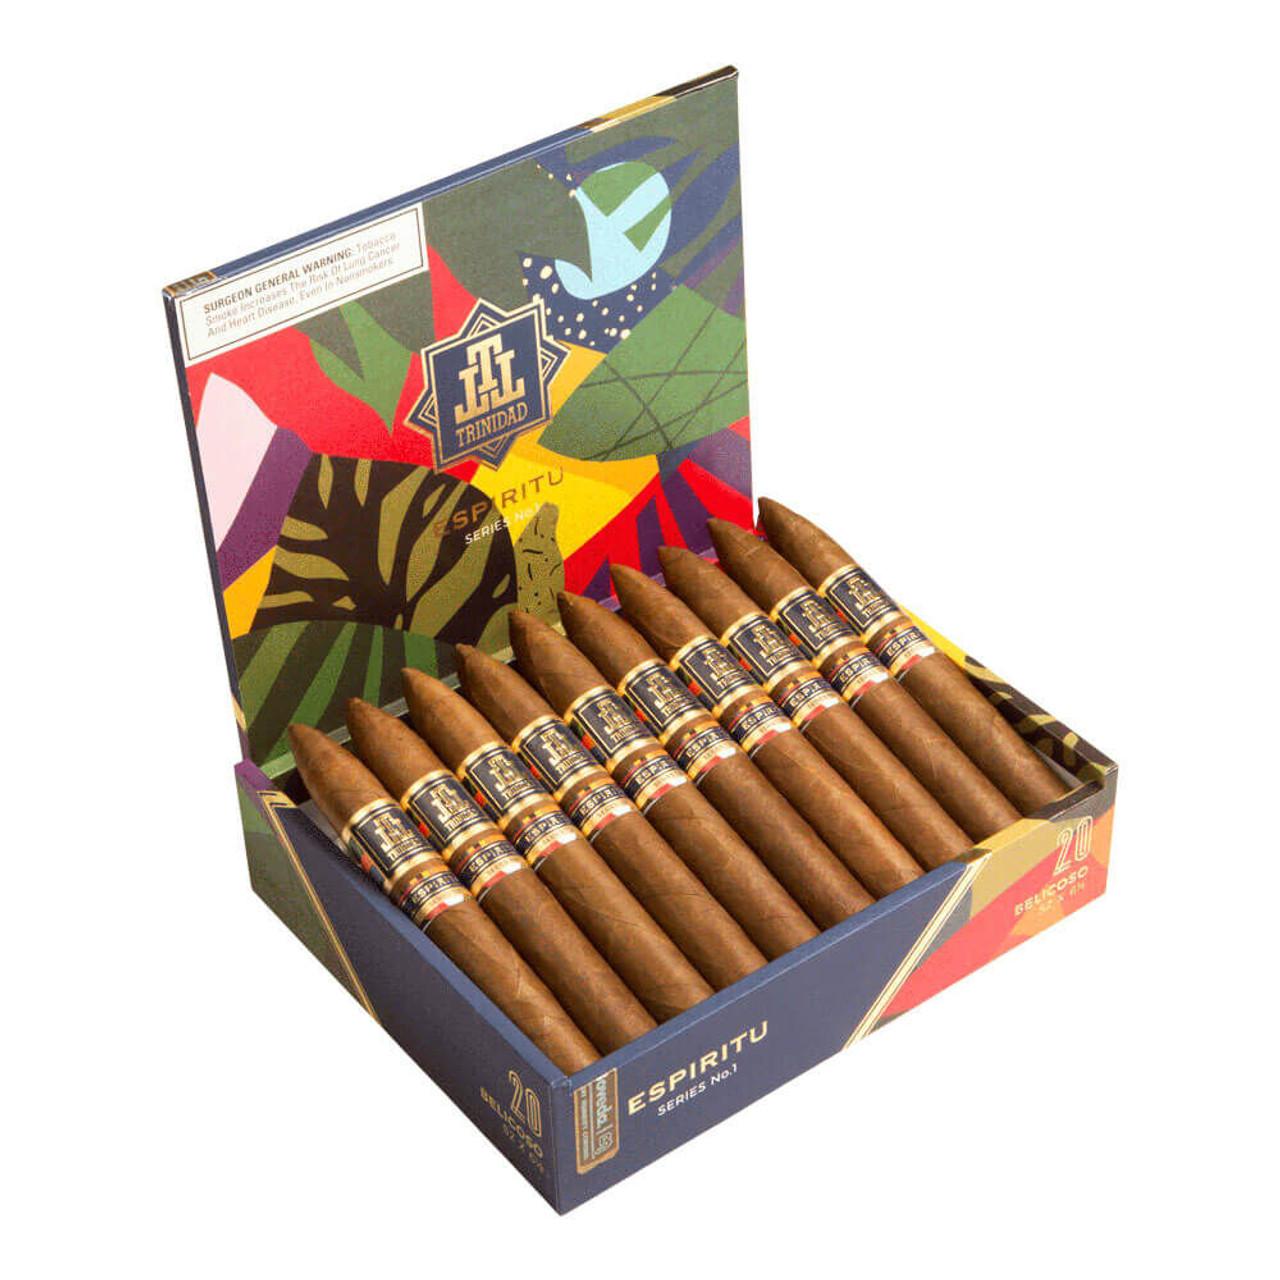 Trinidad Espiritu Belicoso Cigars - 6.12 x 52 (Box of 20)